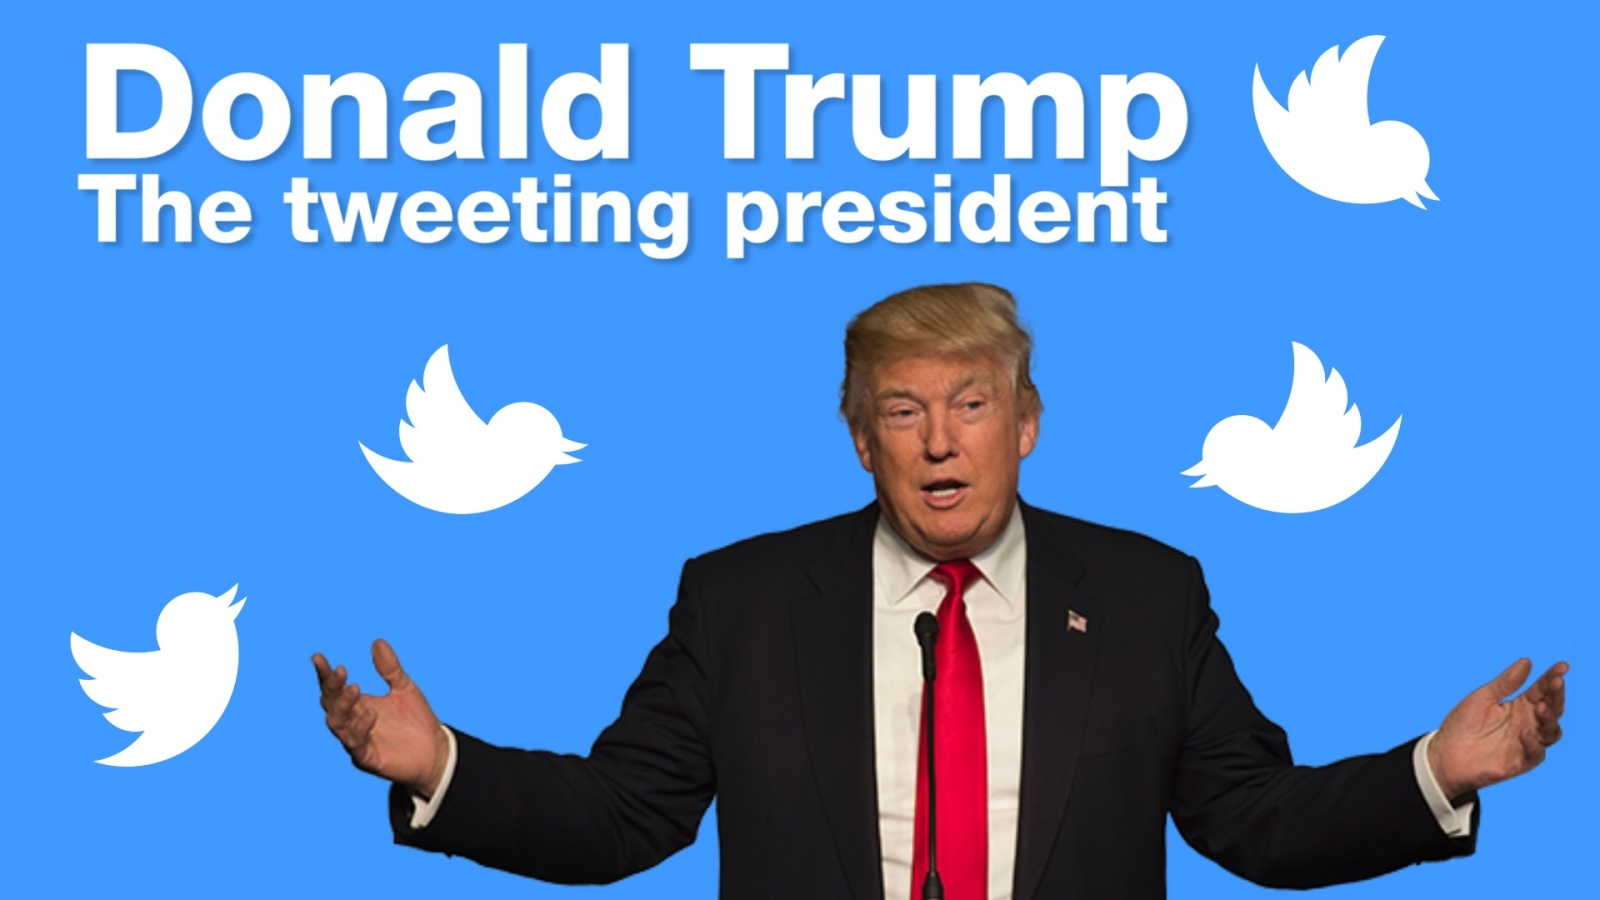 twitter-president-donald-trump